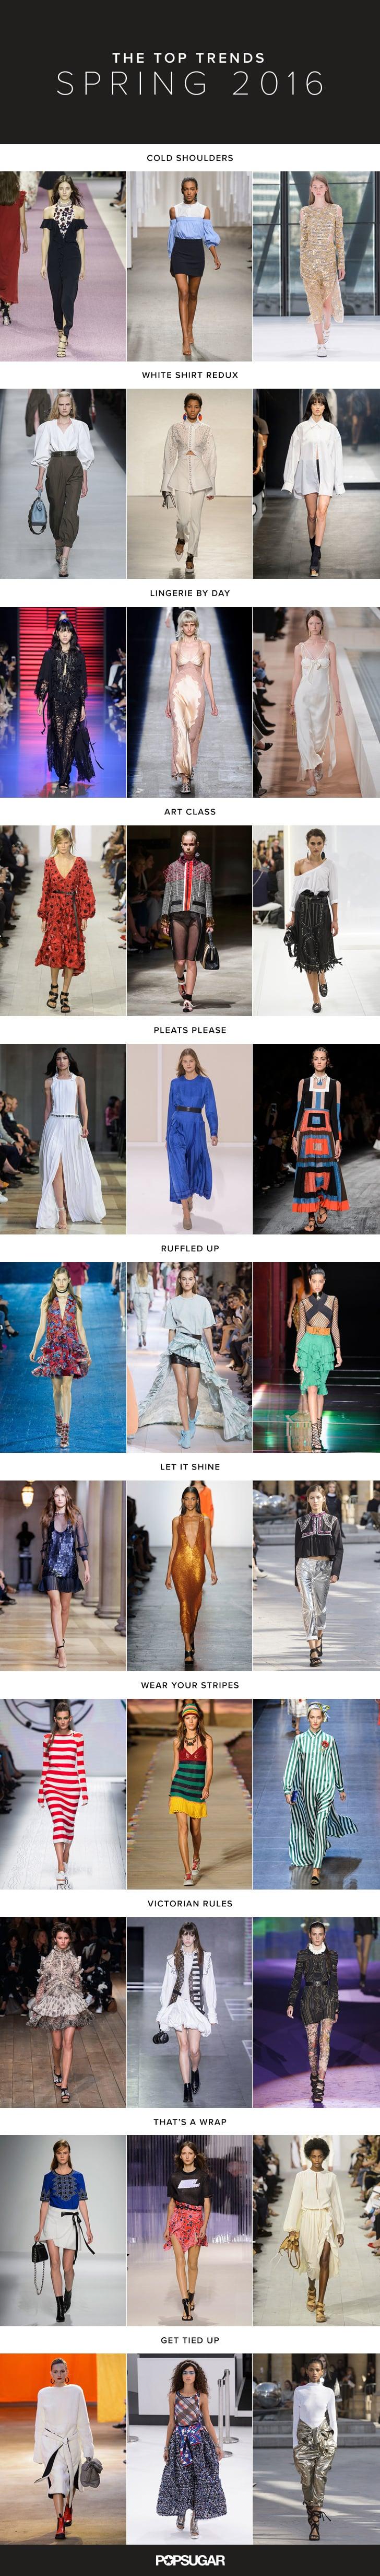 Spring 2016 Trends | Runway